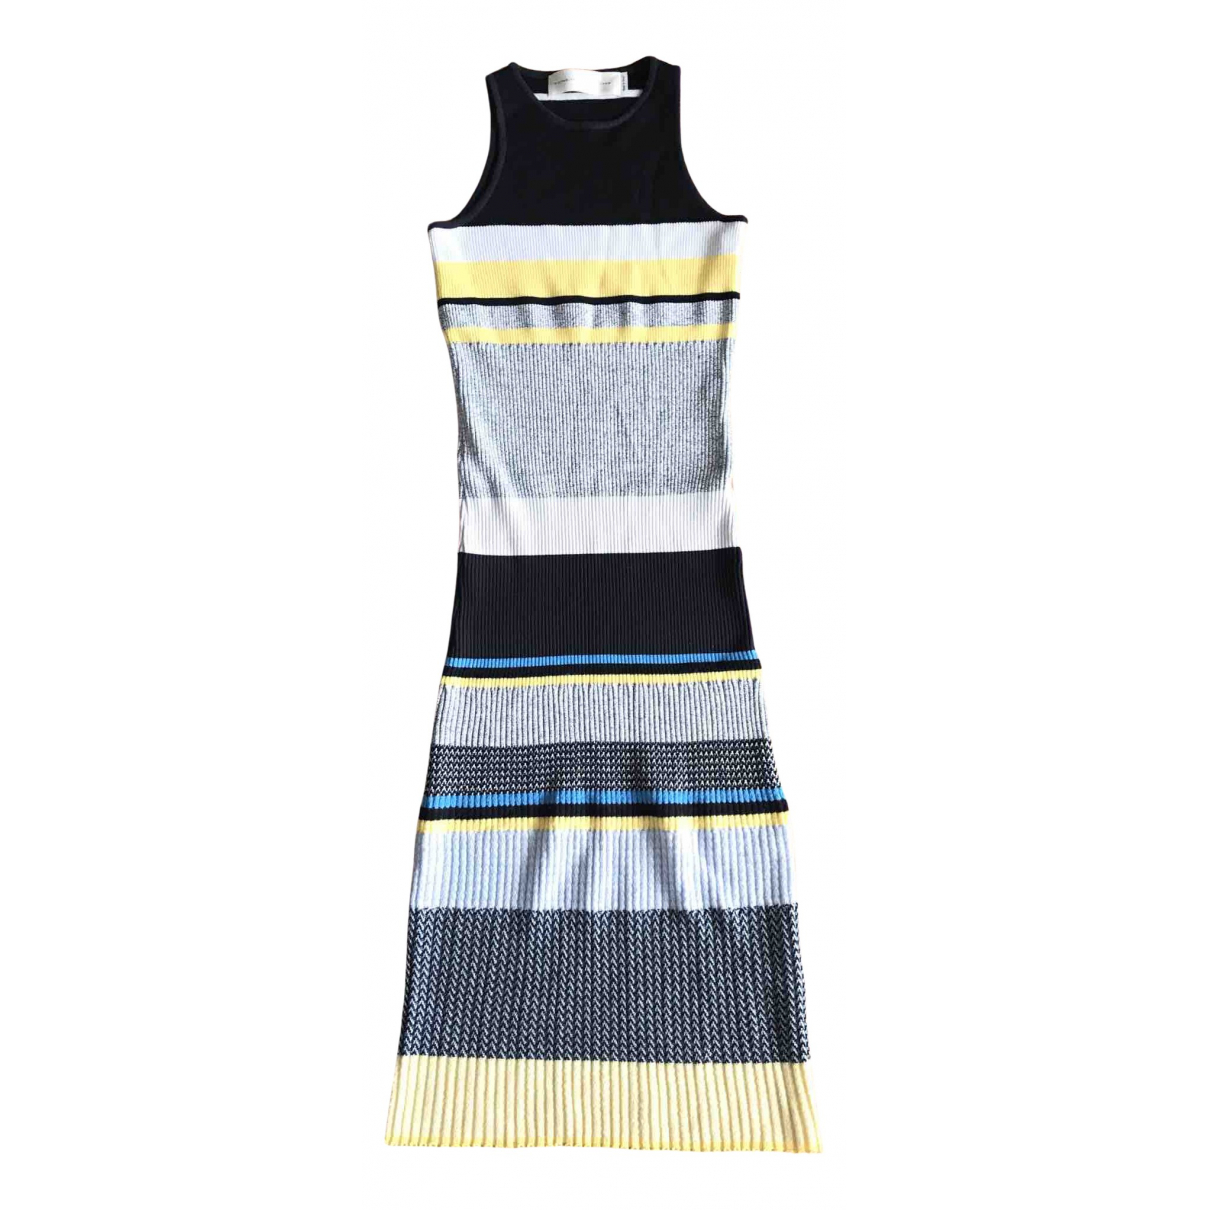 Victoria Beckham - Robe   pour femme - multicolore